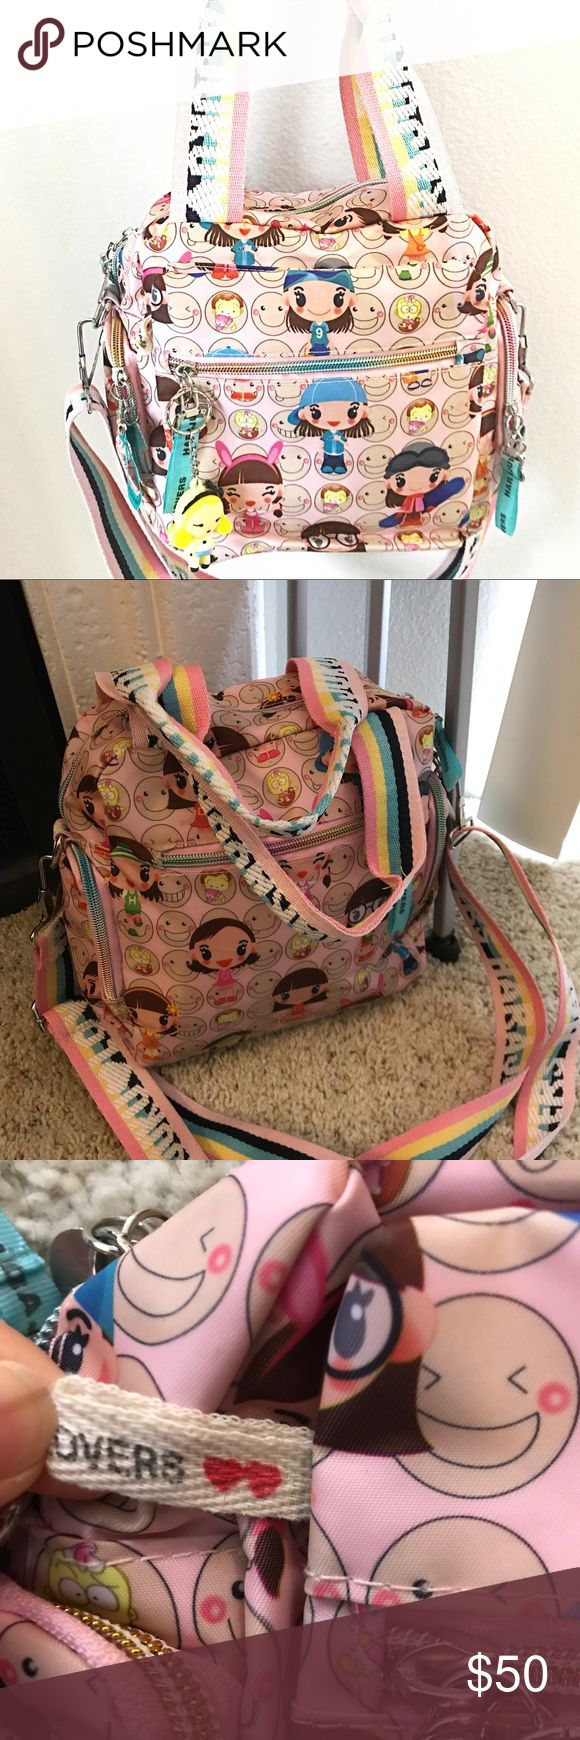 NWOT Harajuku Unicorn Bag Got this in Japan. So gorgeous. Final price! Harajuku Lovers Bags Satchels